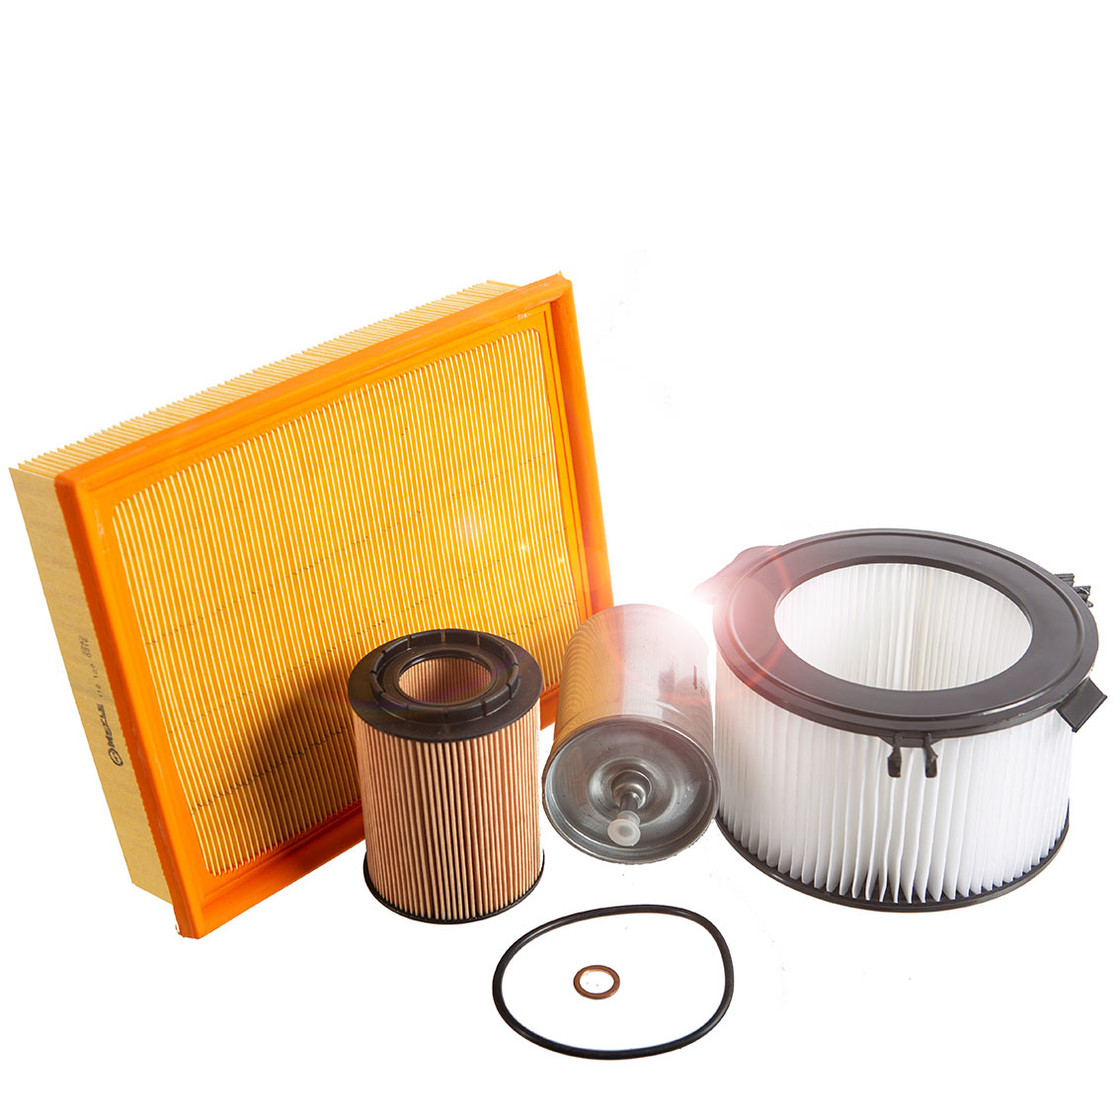 VE375100 Cambiare Eng Man Air Temp Sensor